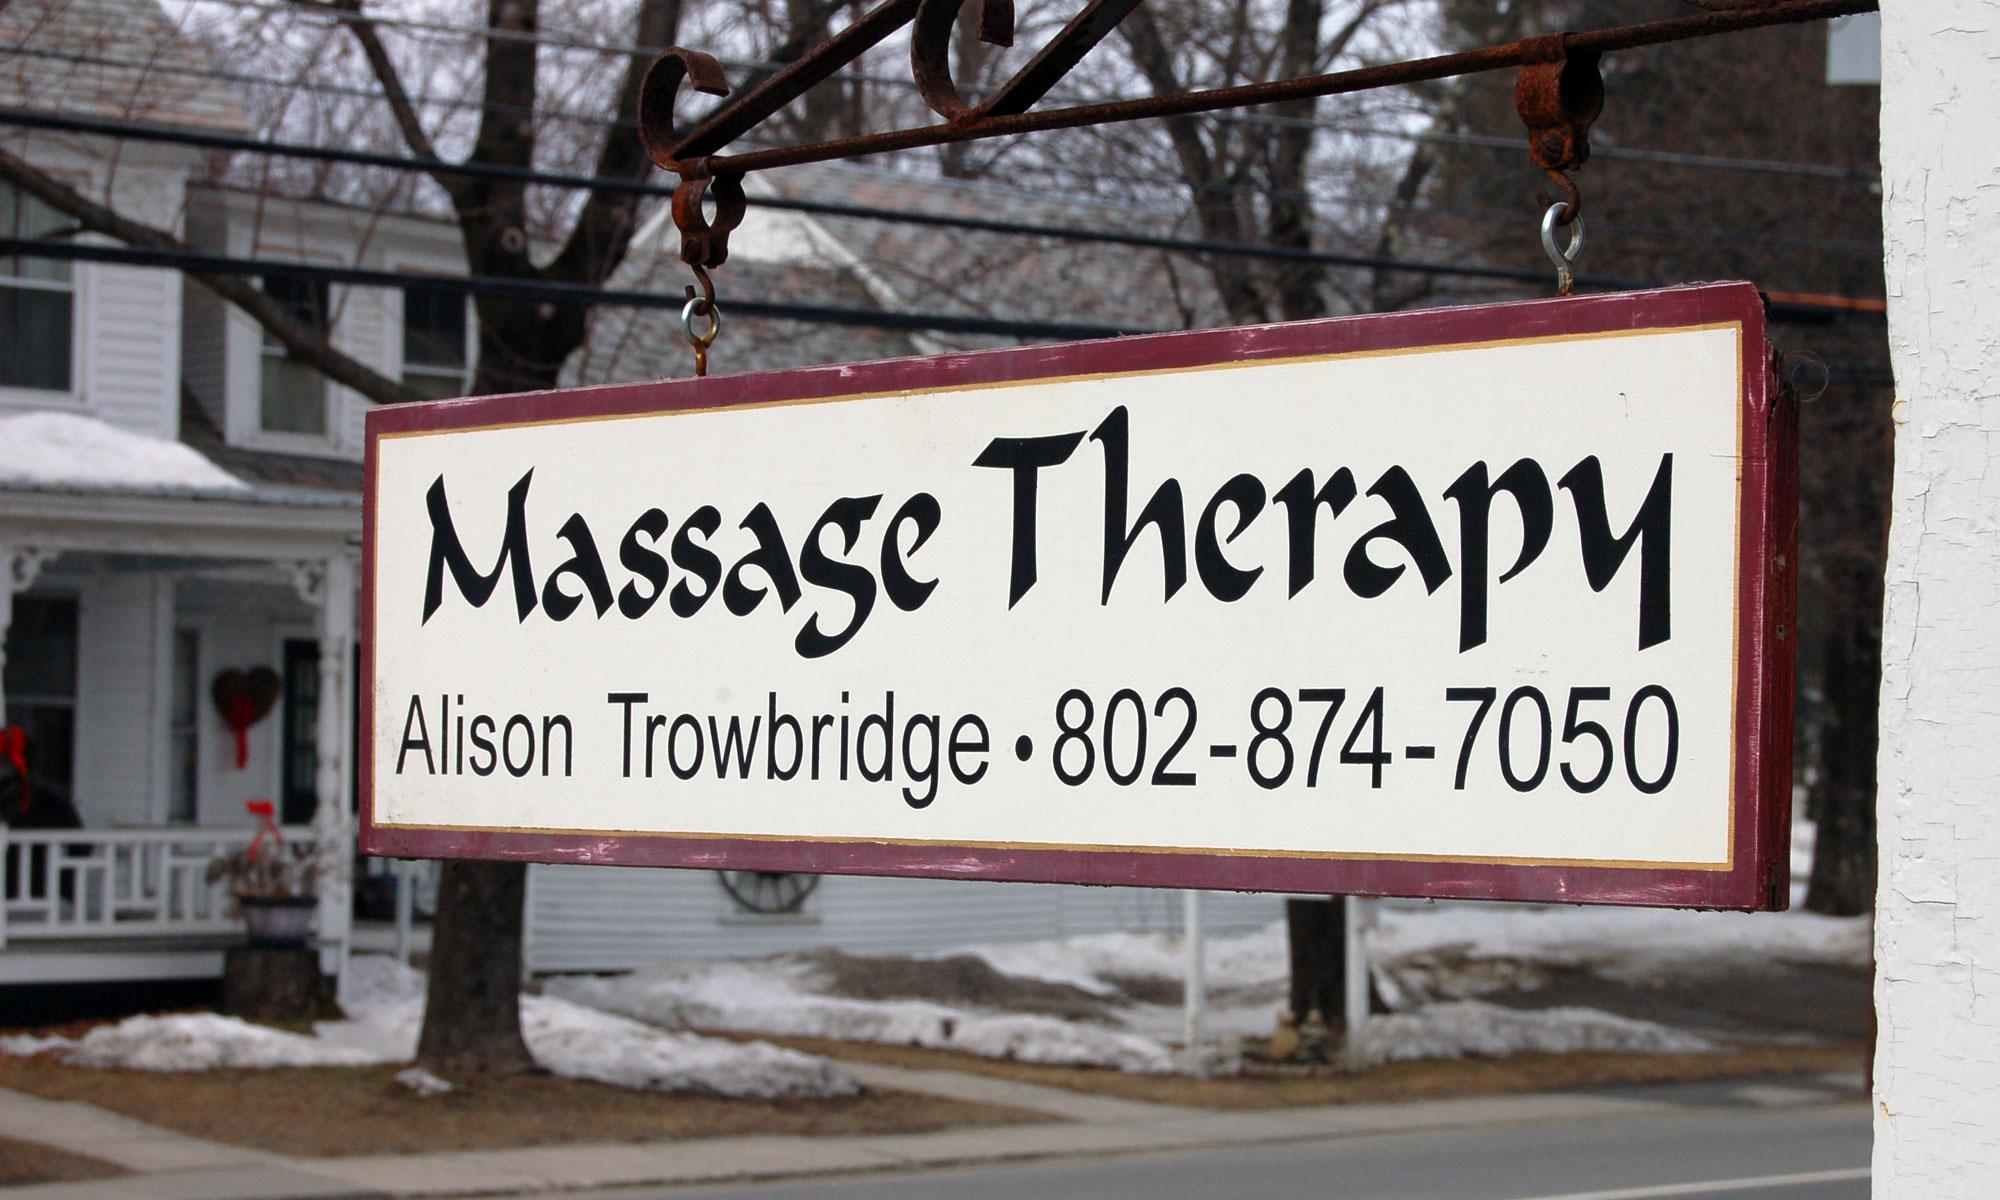 Alison-Trowbridge-Massage-Therapy-Sign